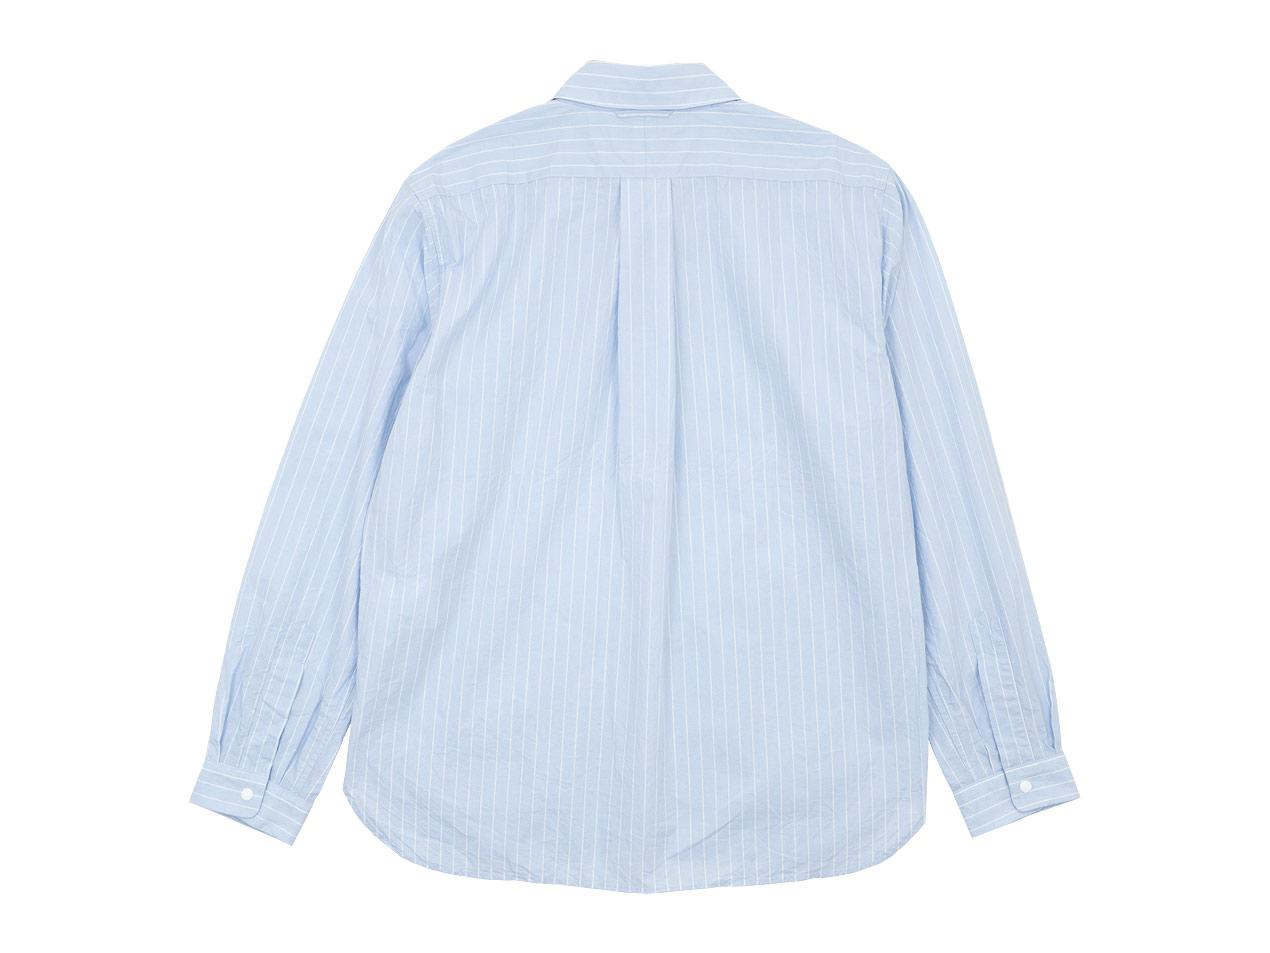 YAECA コンフォートシャツ リラックス ロング BANKER STRIPE 〔メンズ〕